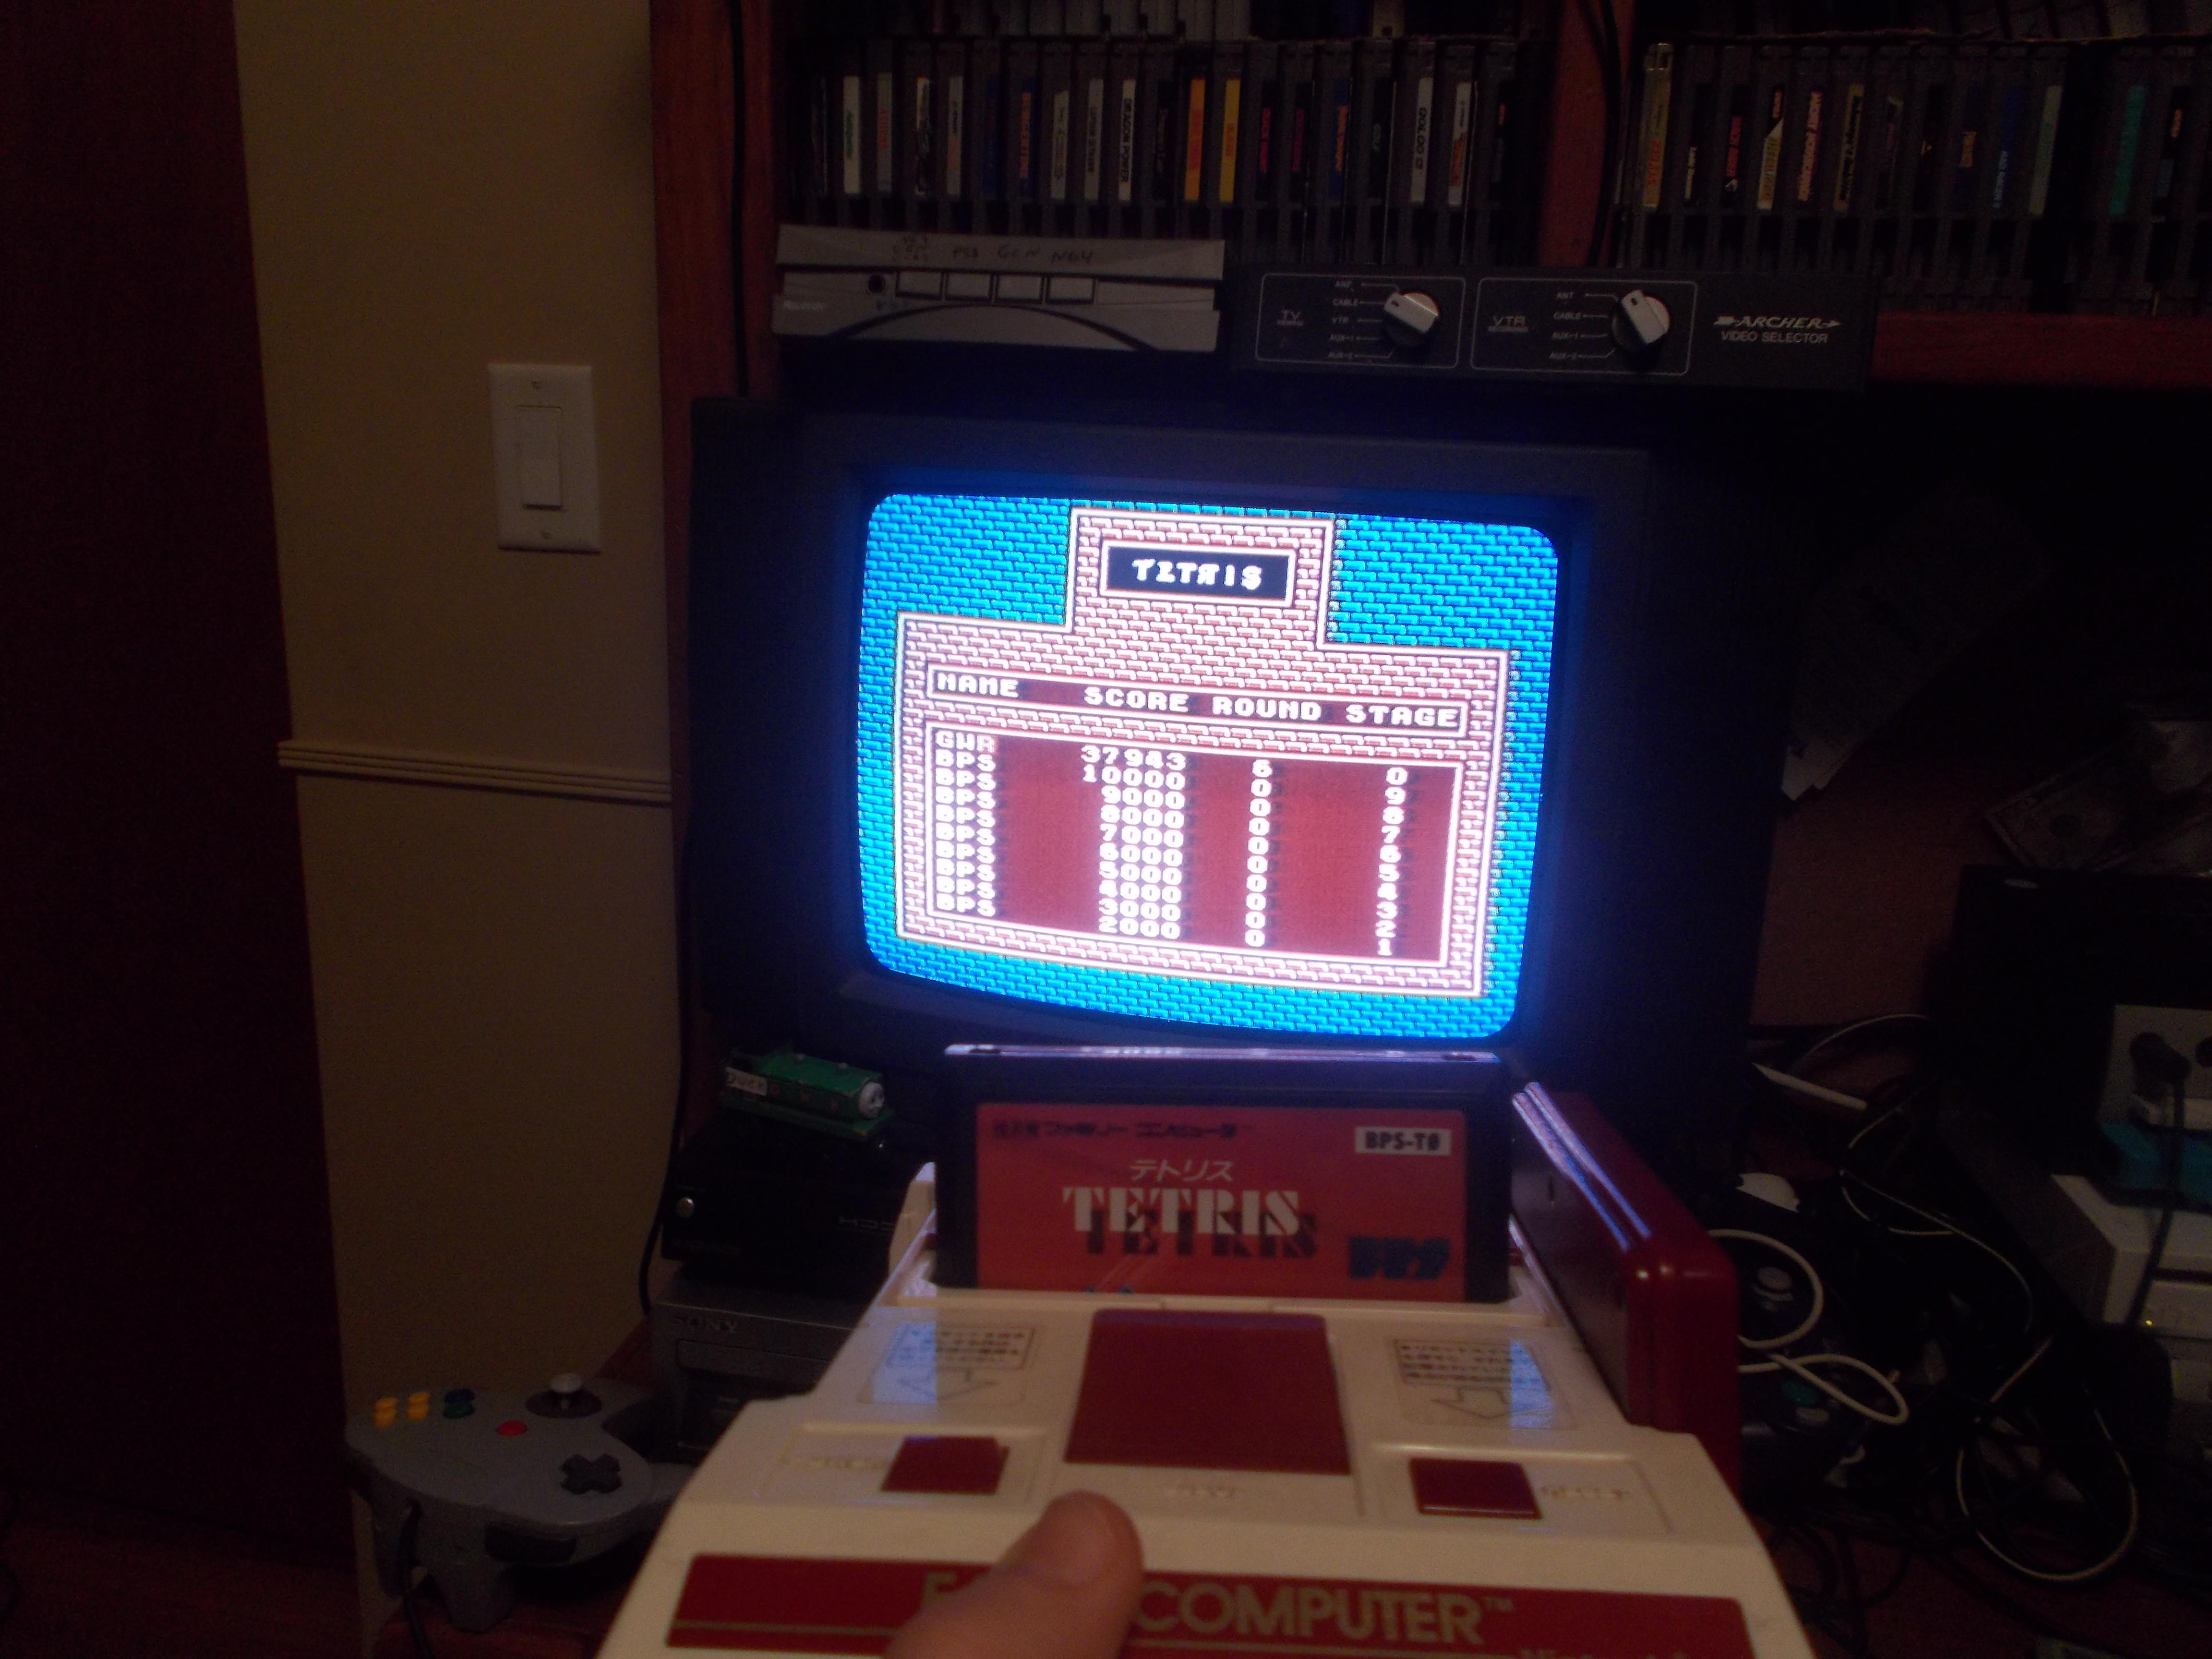 DuckGWR: Tetris [BPS] (NES/Famicom) 37,943 points on 2014-11-19 21:47:52